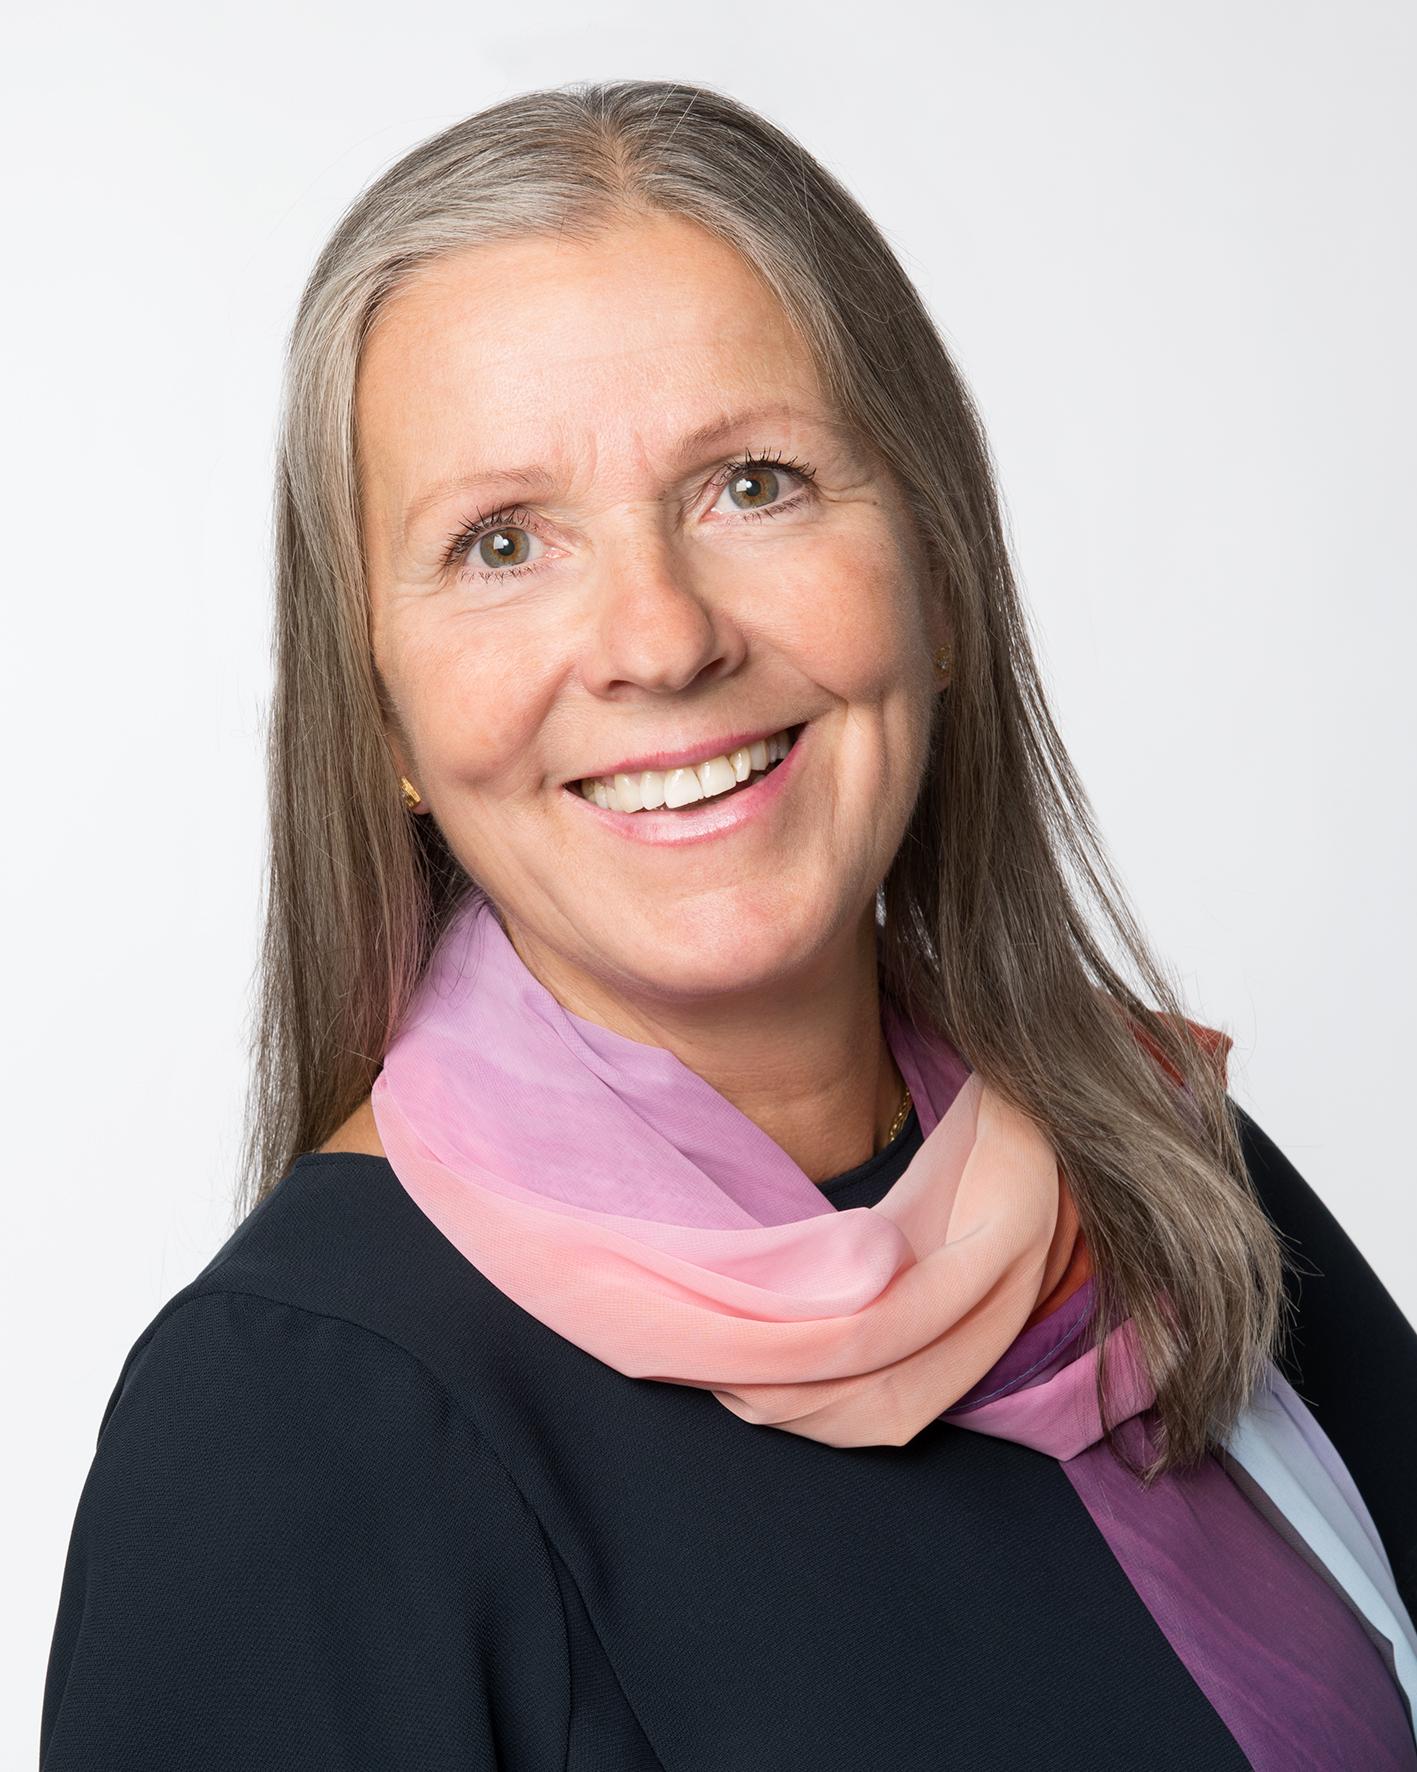 DG Arja Rantanen